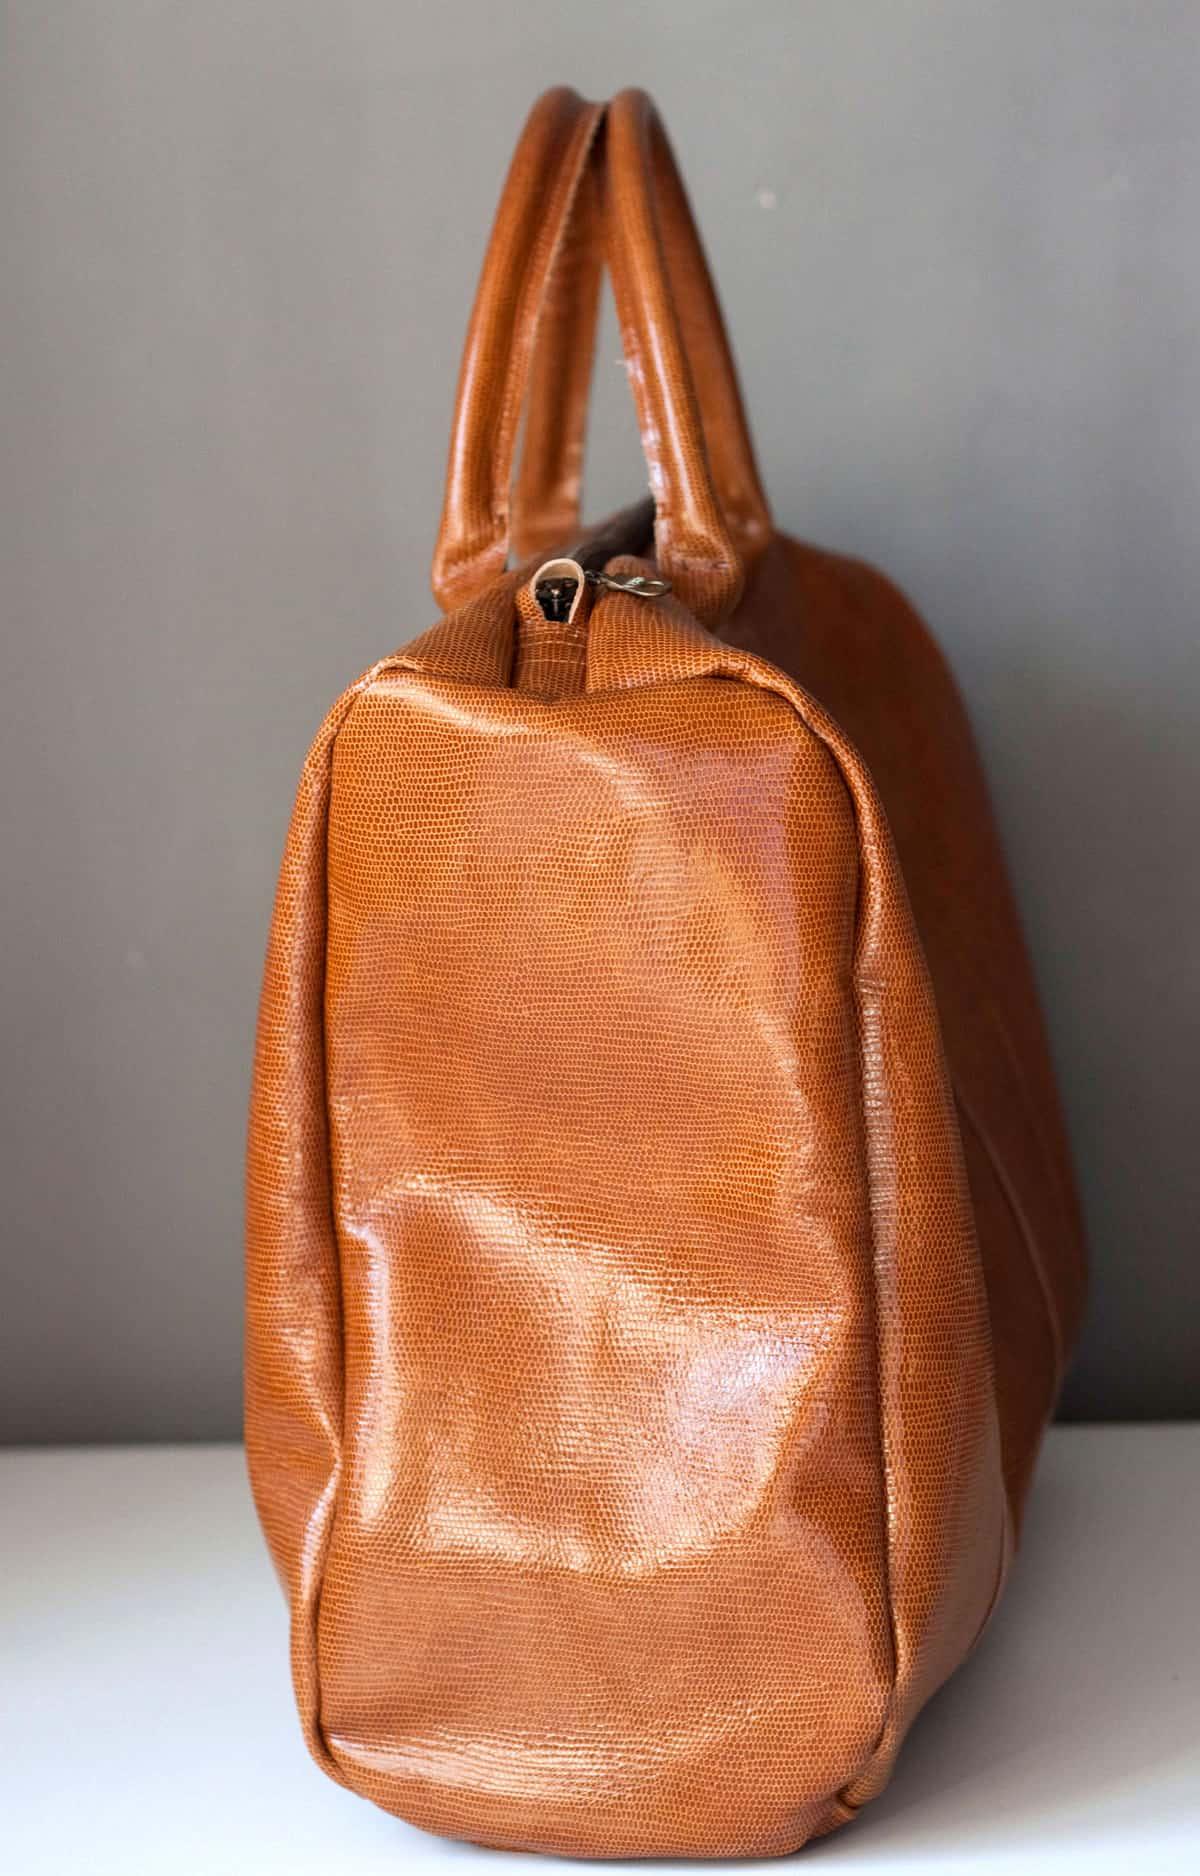 wielka-walizka-skora-4